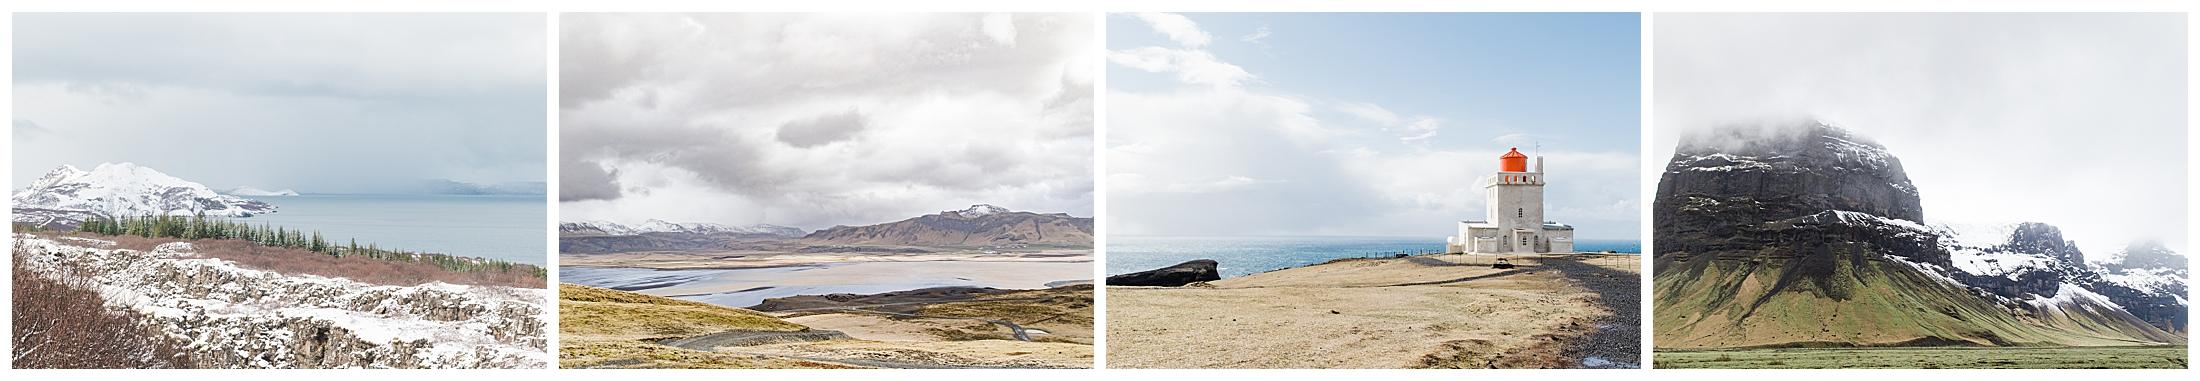 Iceland-Travel-Itinerary-14.jpg